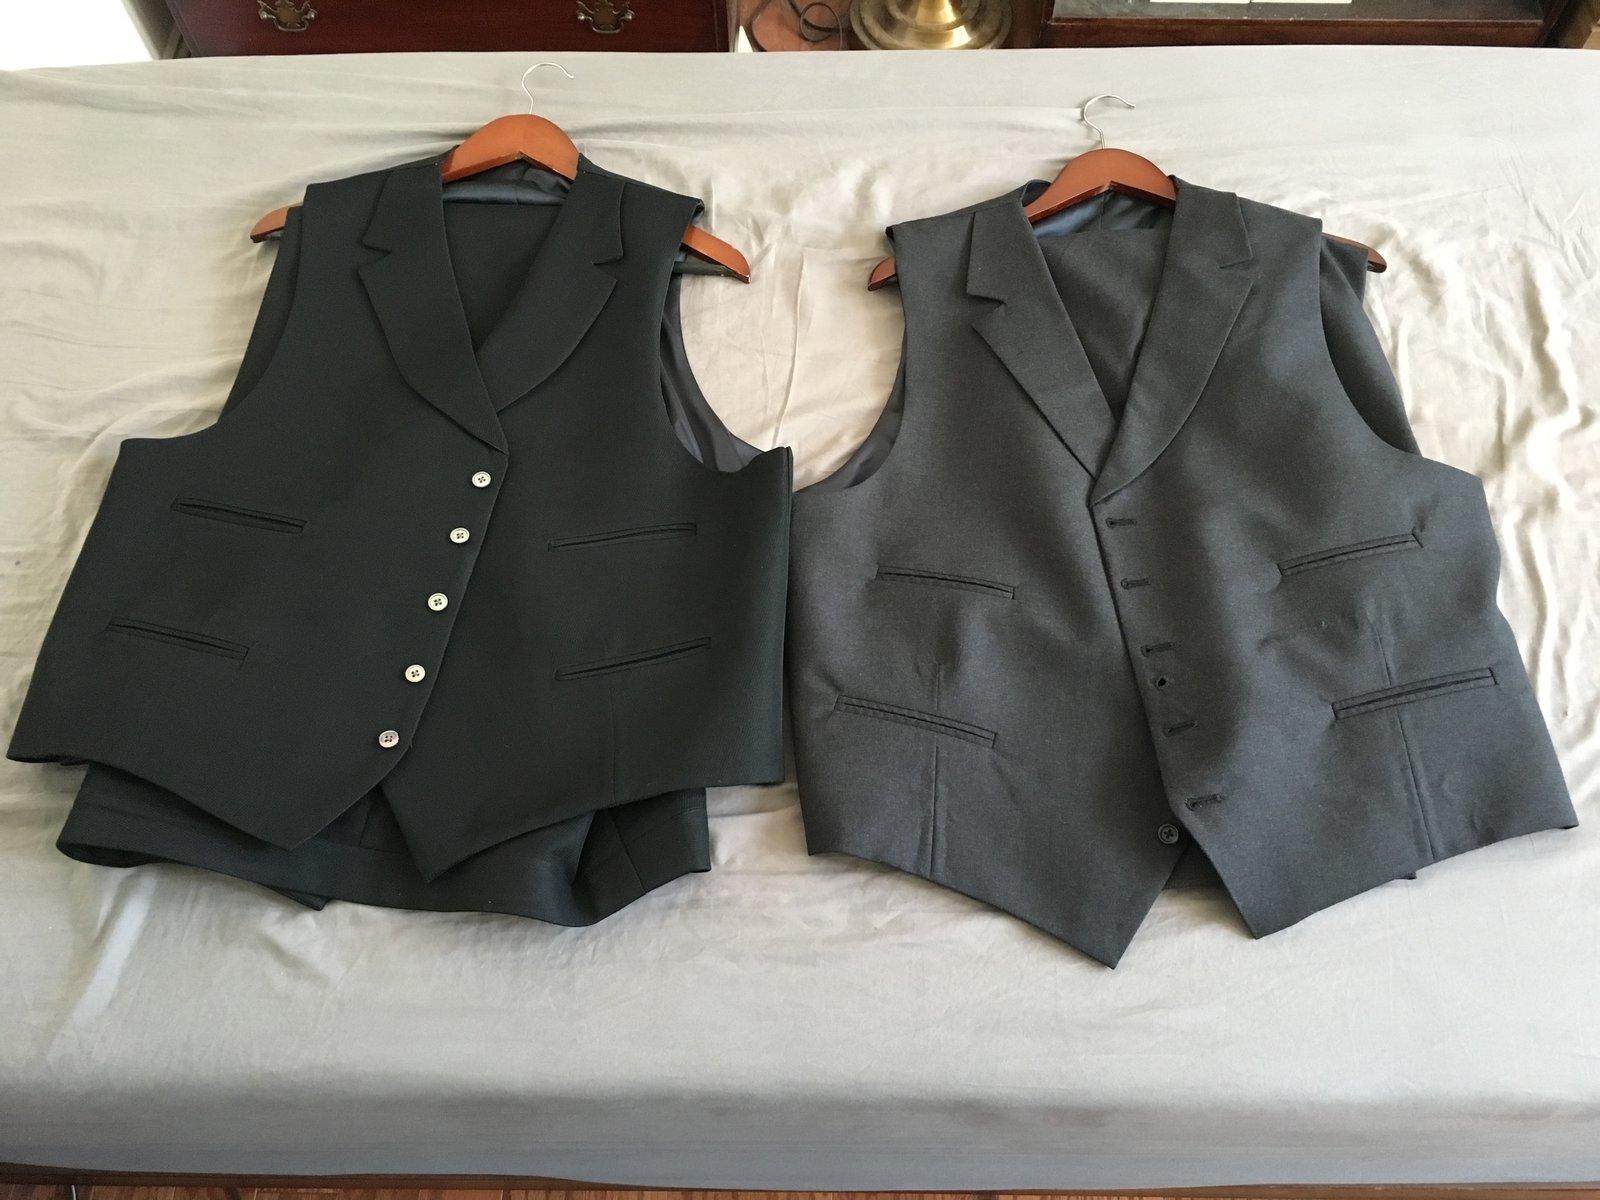 Black and Grey Waistcoats.JPG